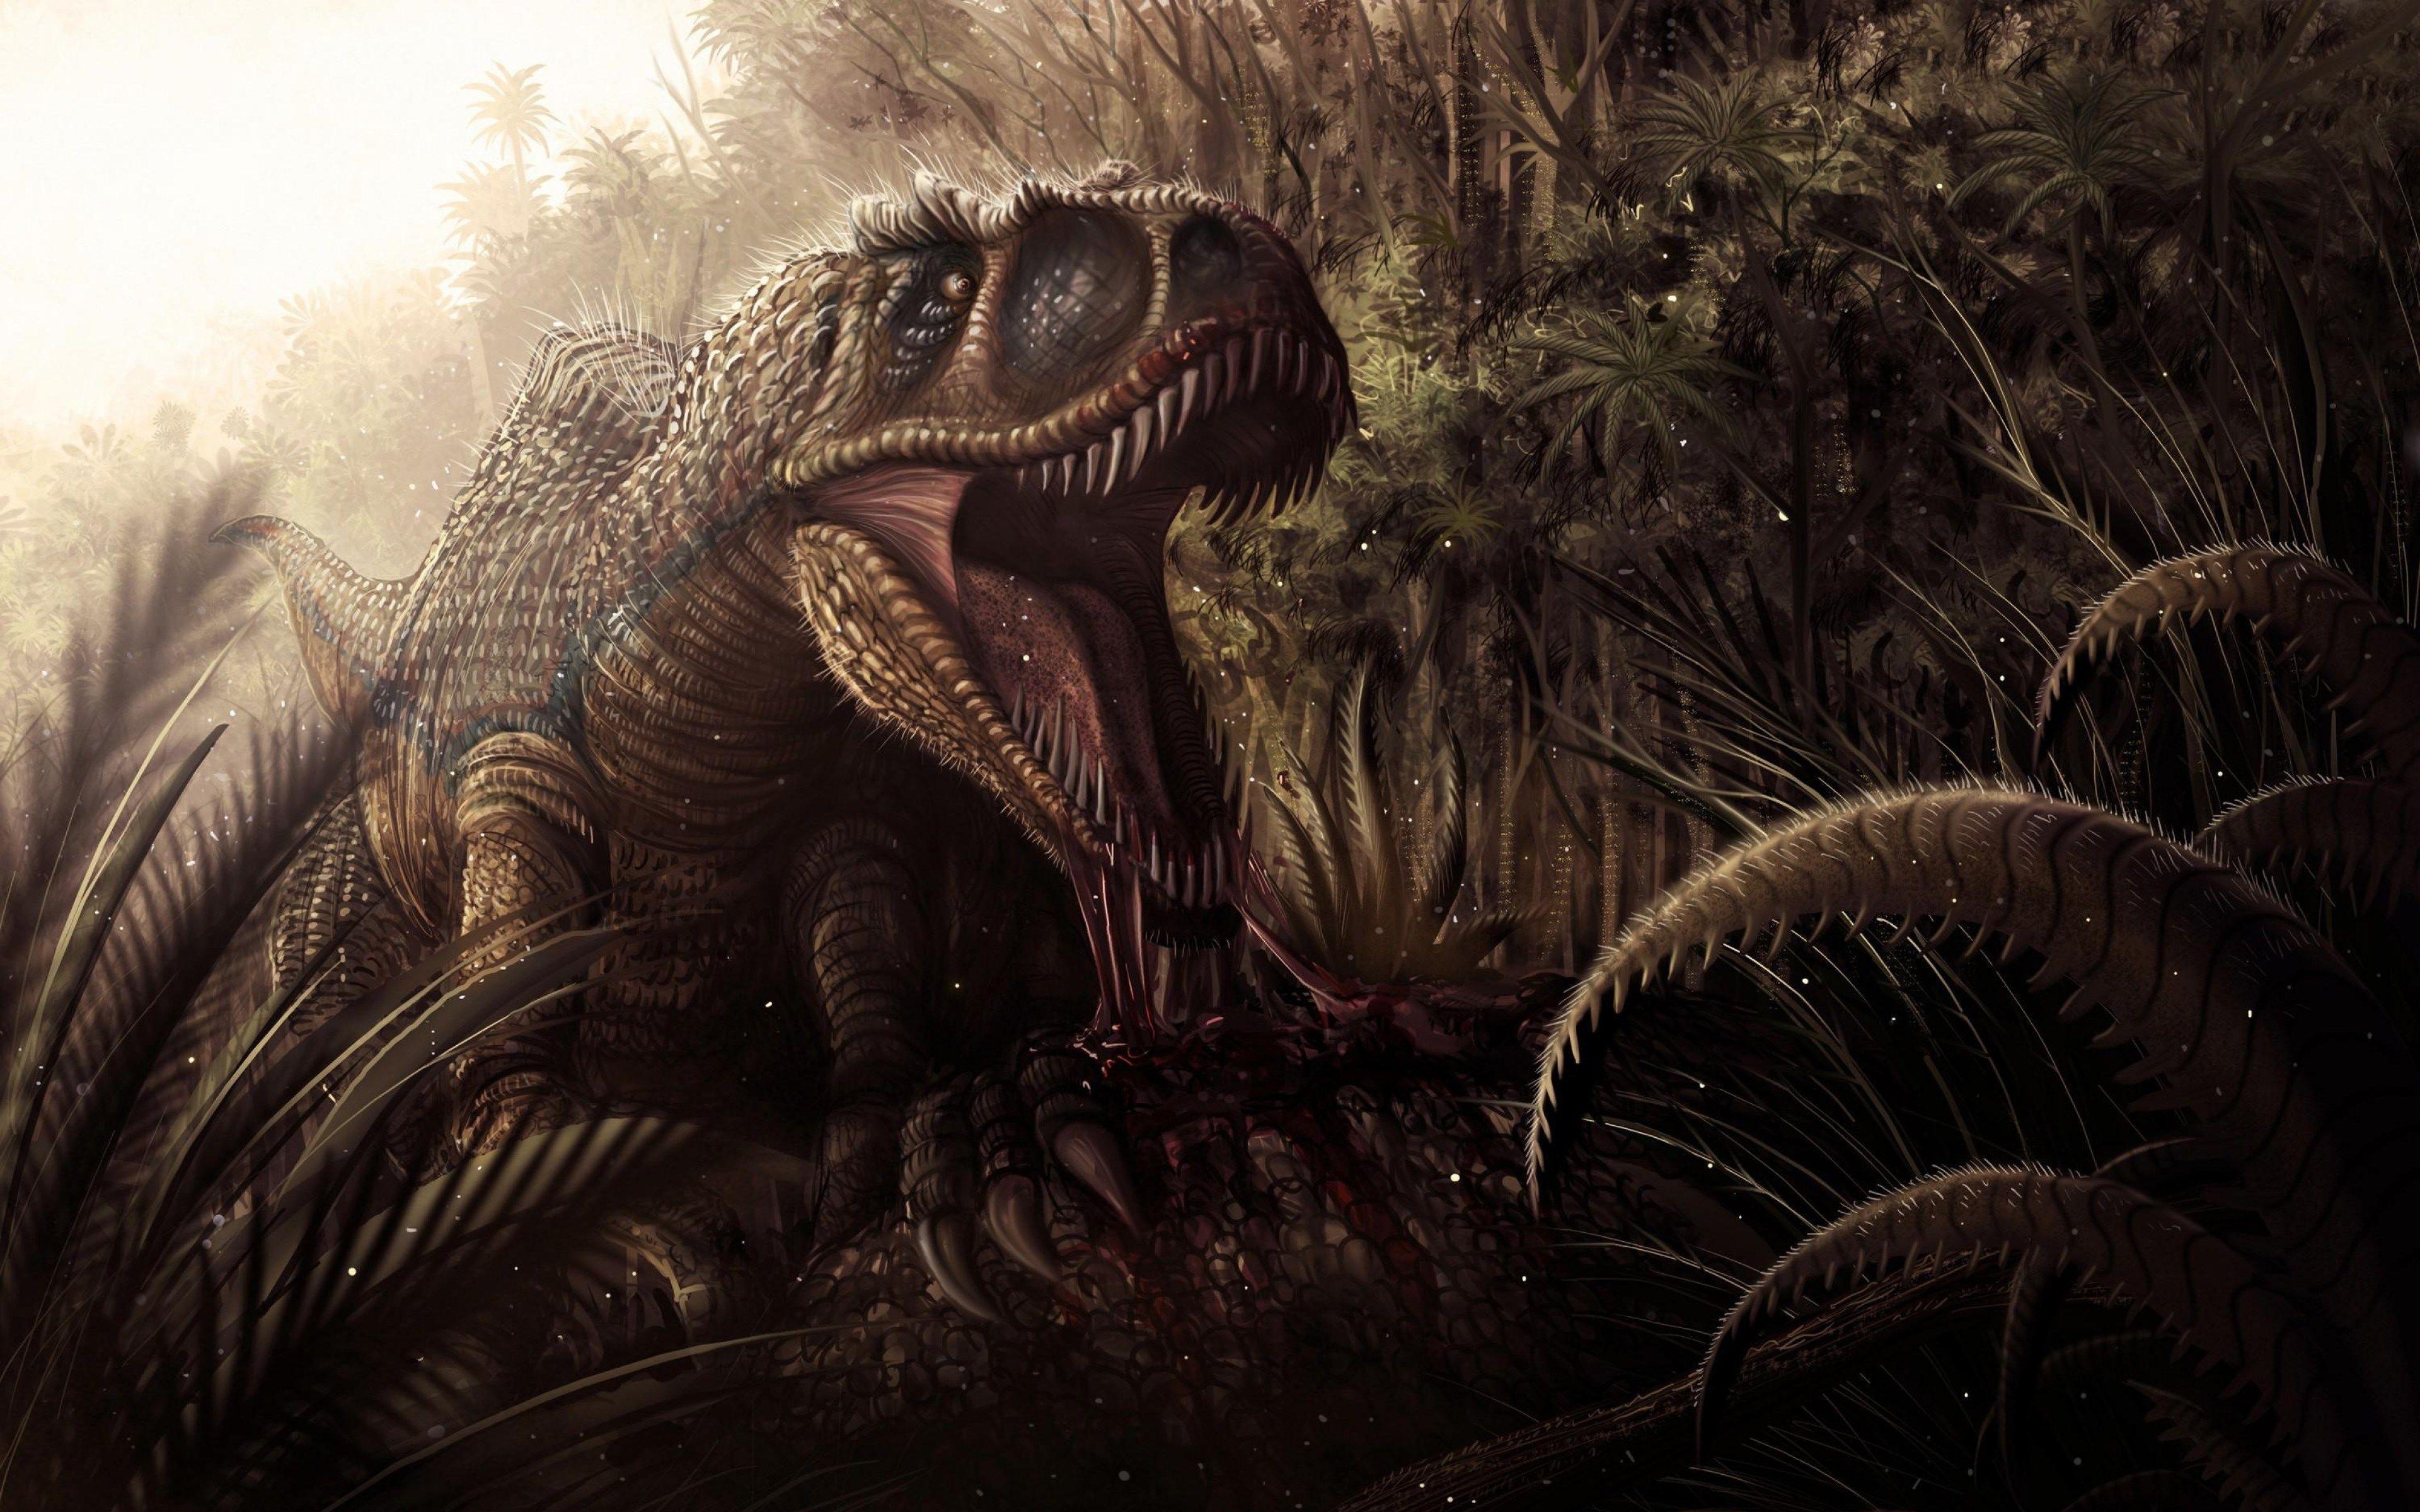 Dinosaur Free Hd Widescreen Dinozavry Koncepty Sushestv Oboi